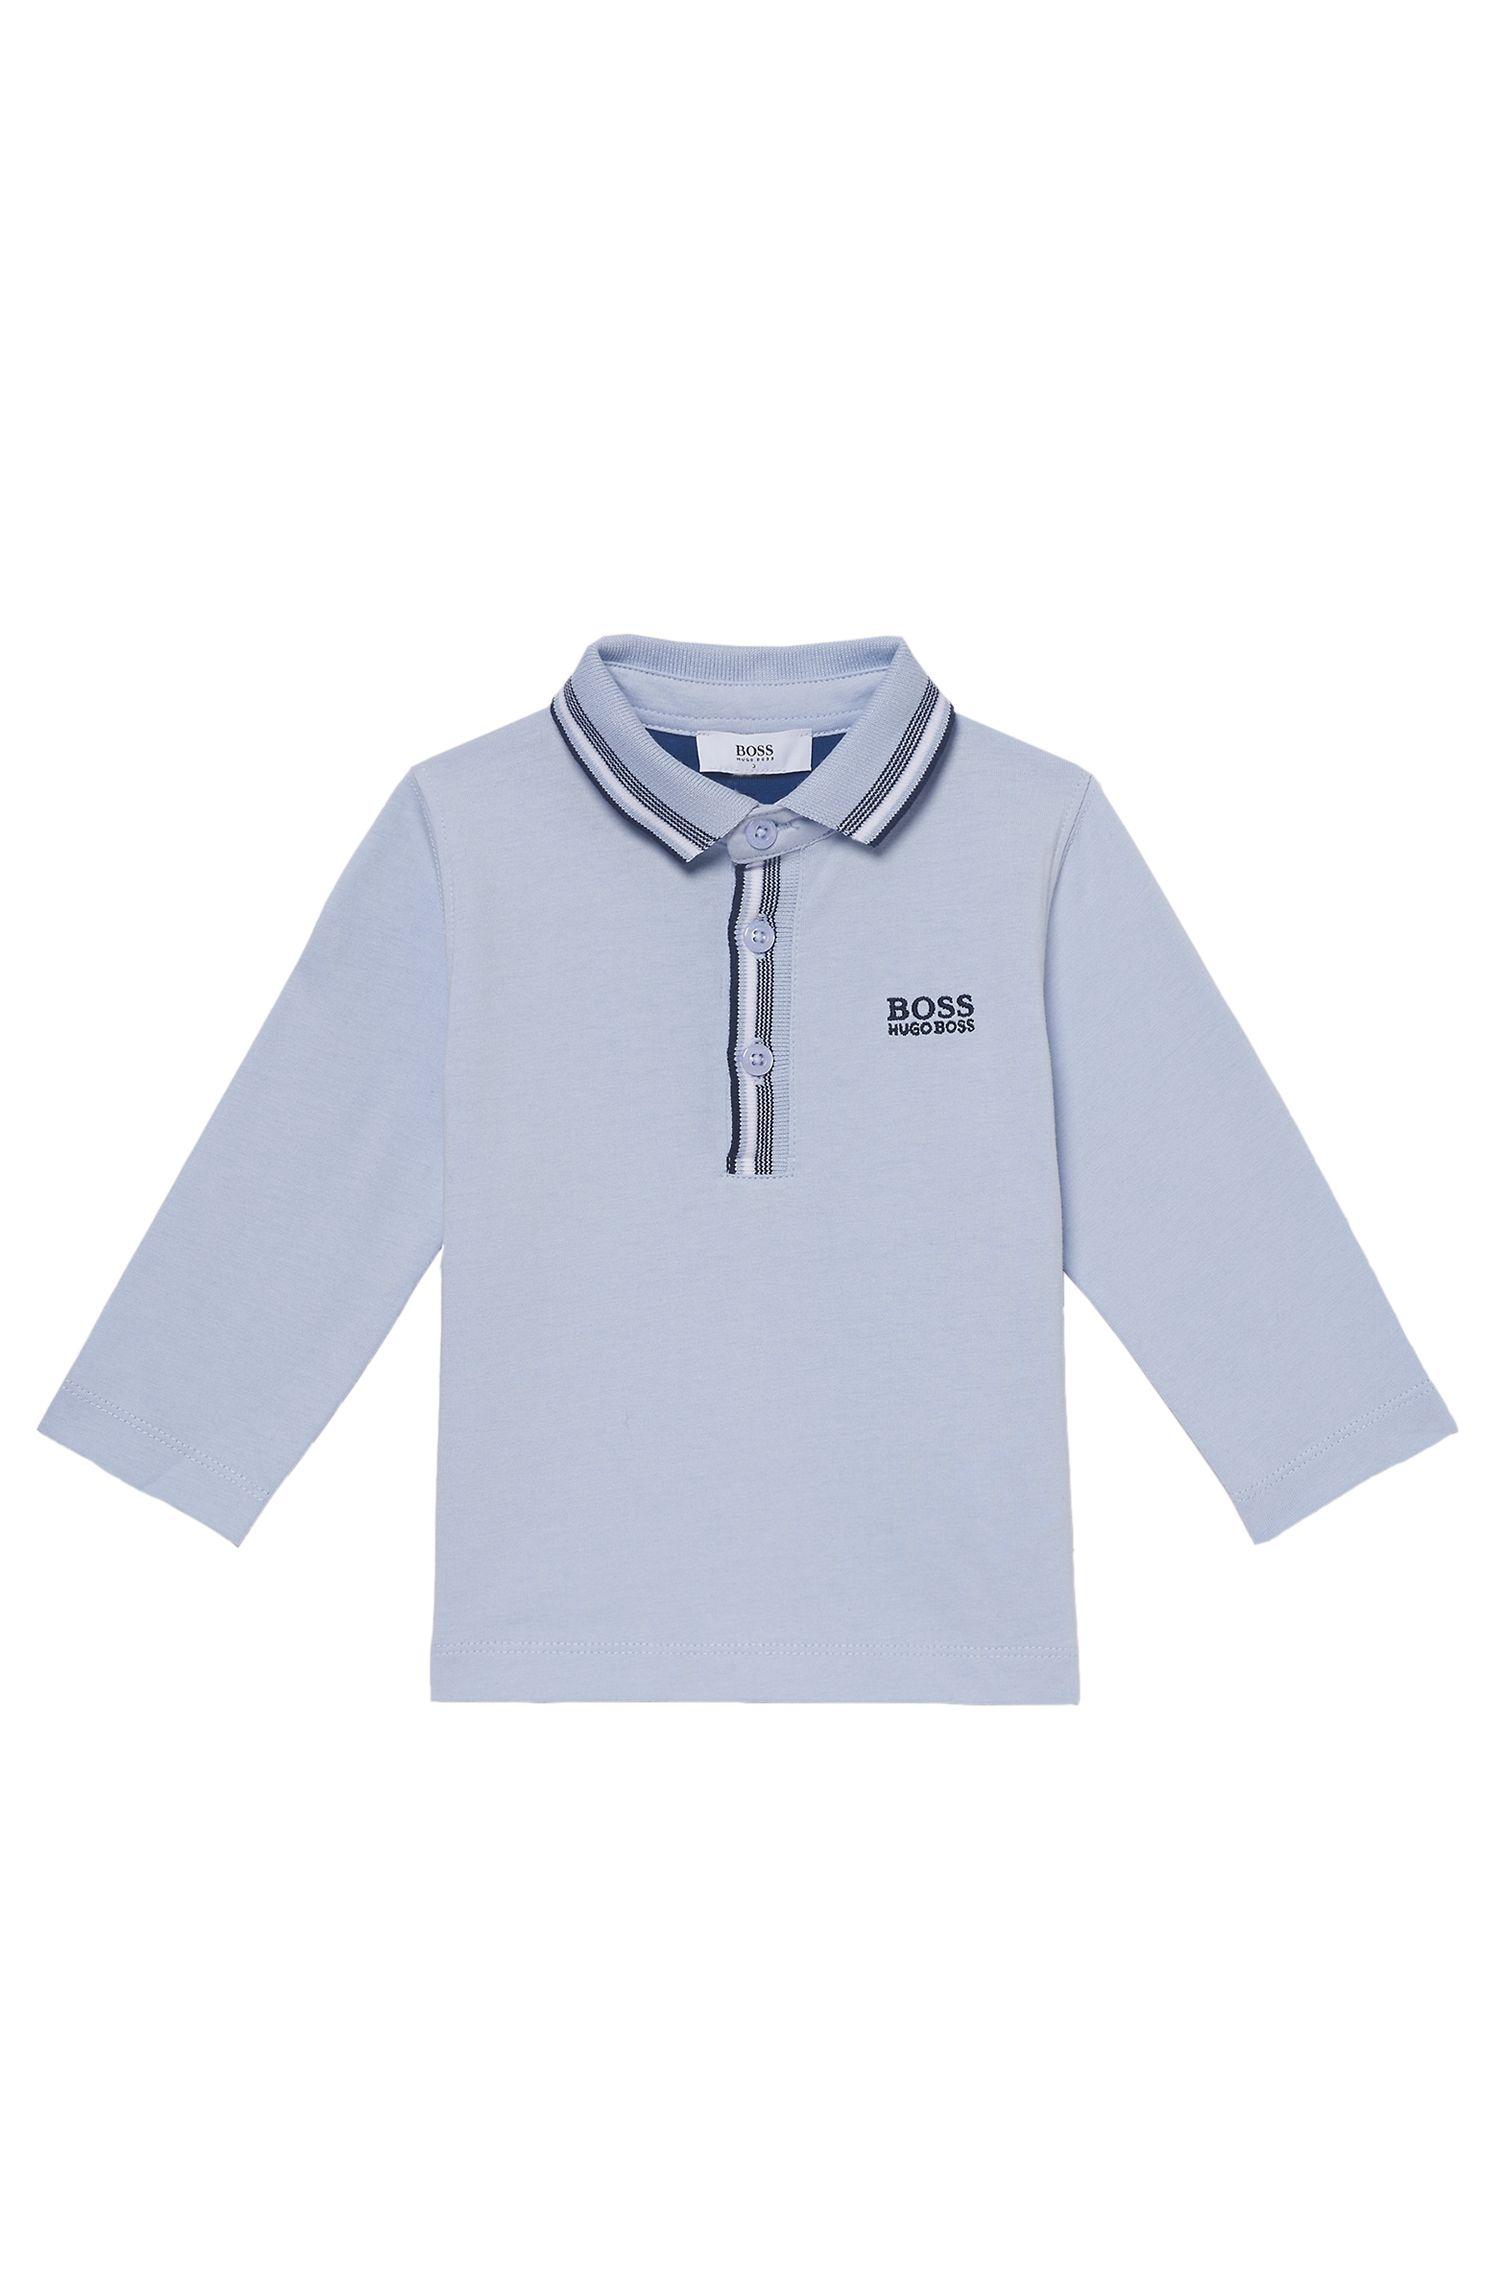 'J05500' | Toddler Stretch Cotton Blend Polo Shirt